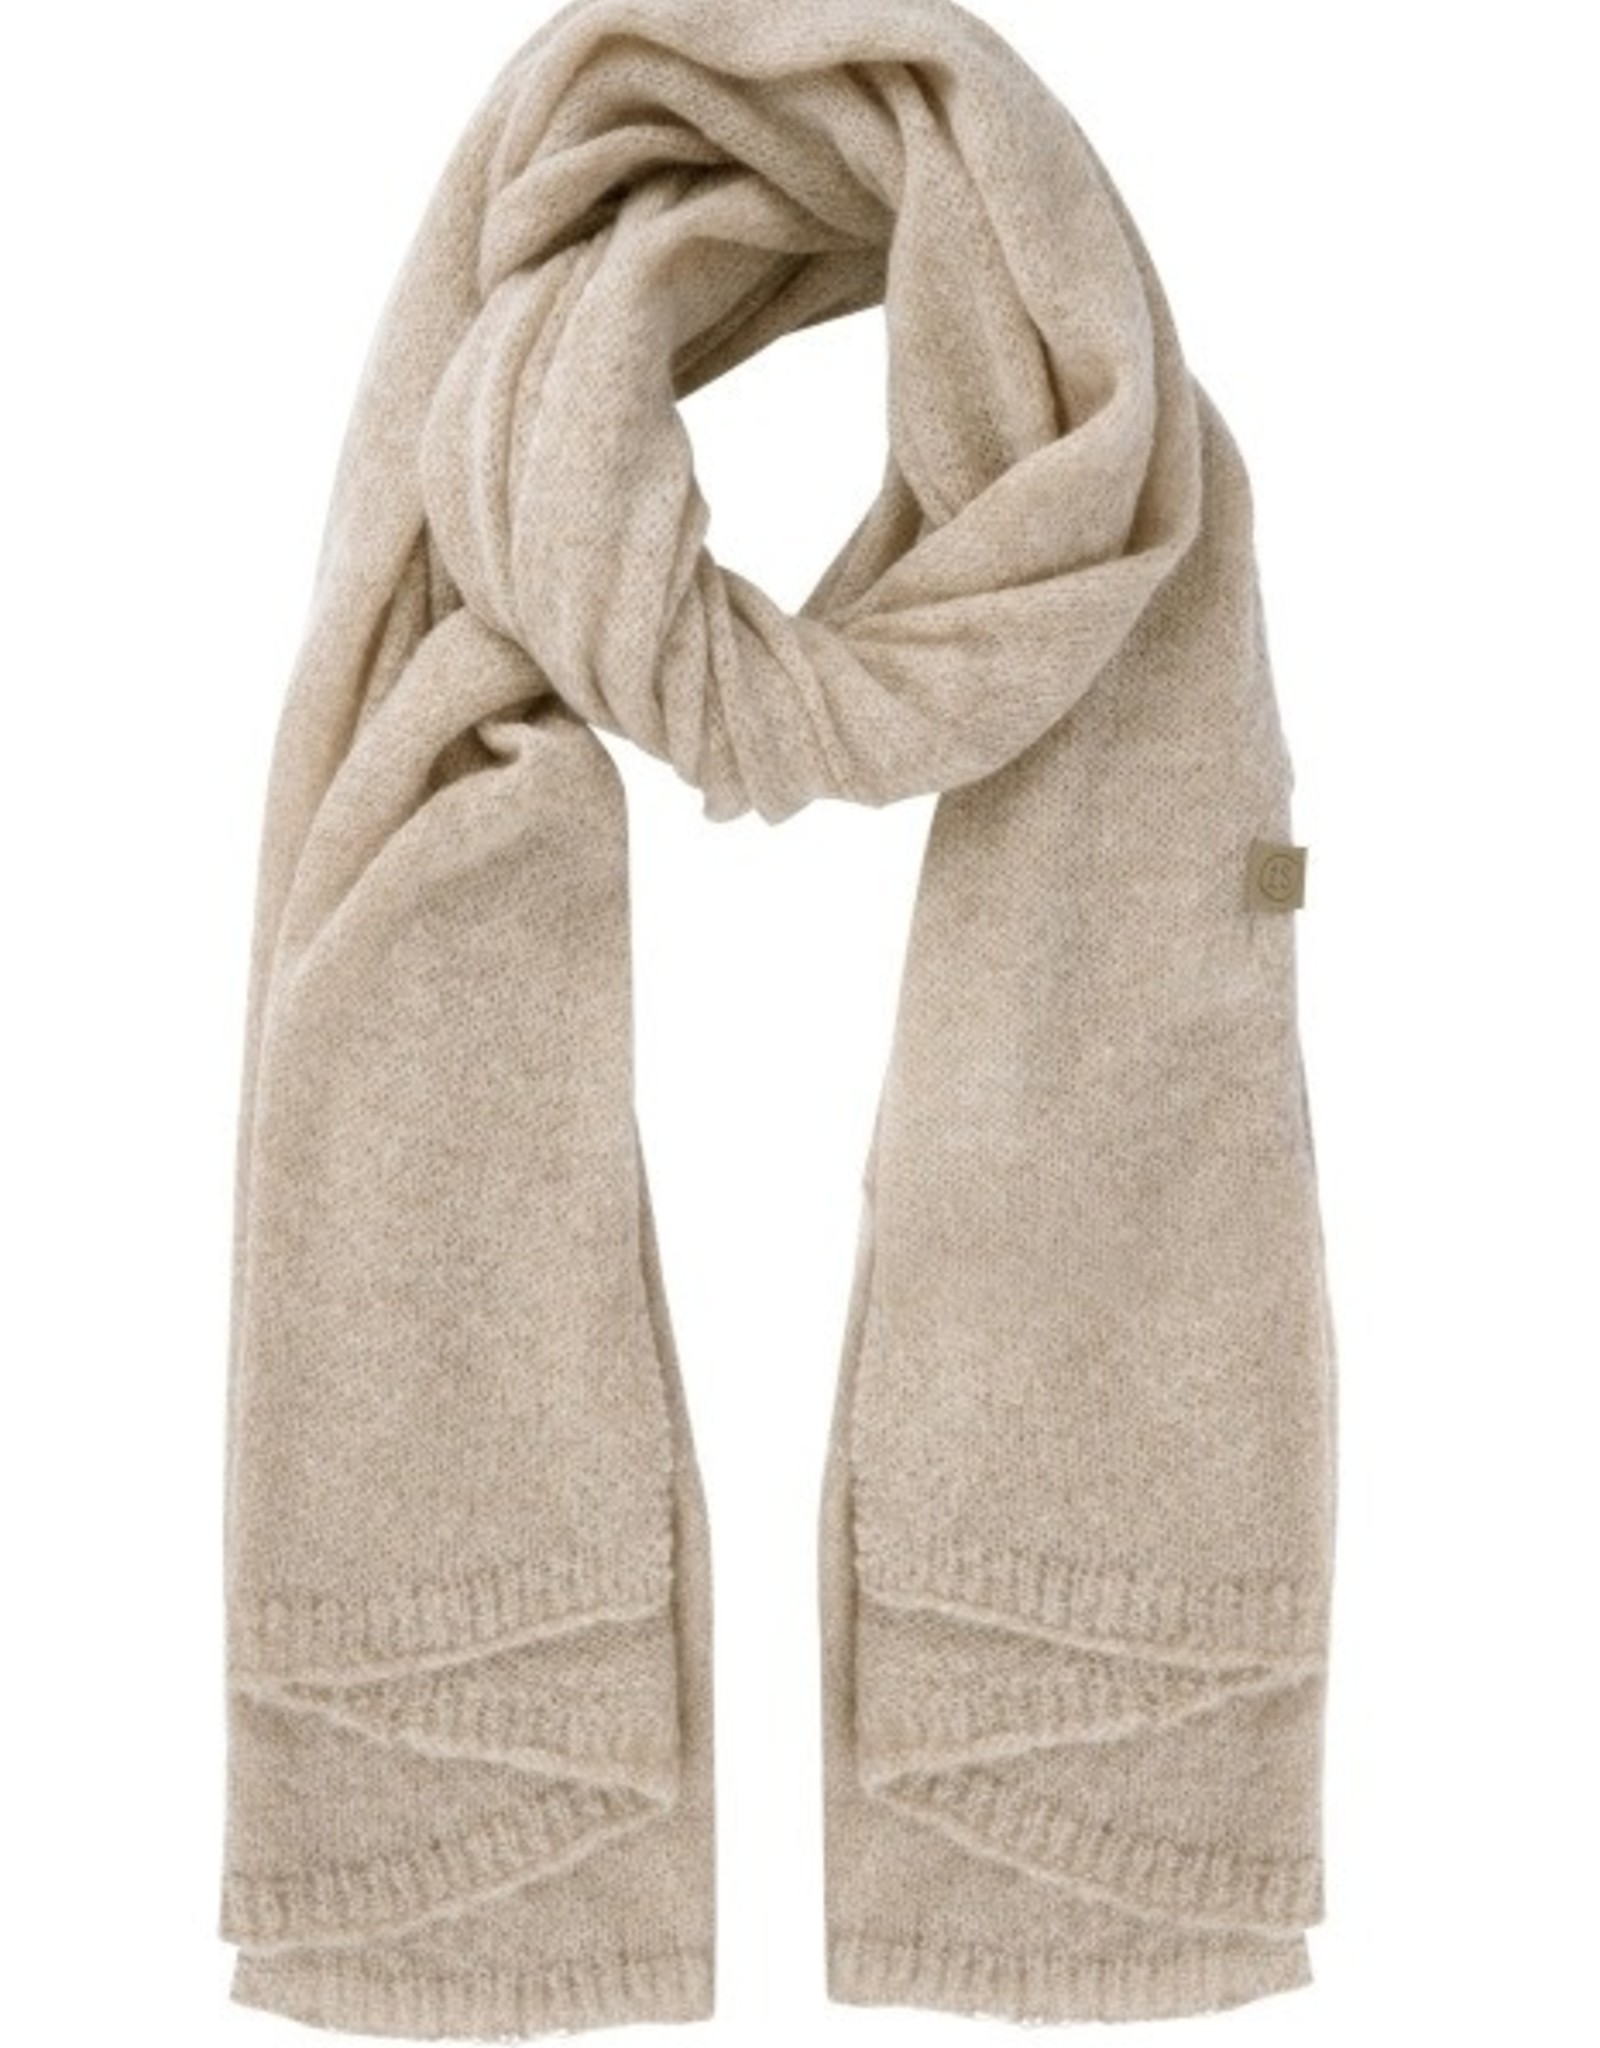 Zusss Zusss - Warme brei sjaal - Zand